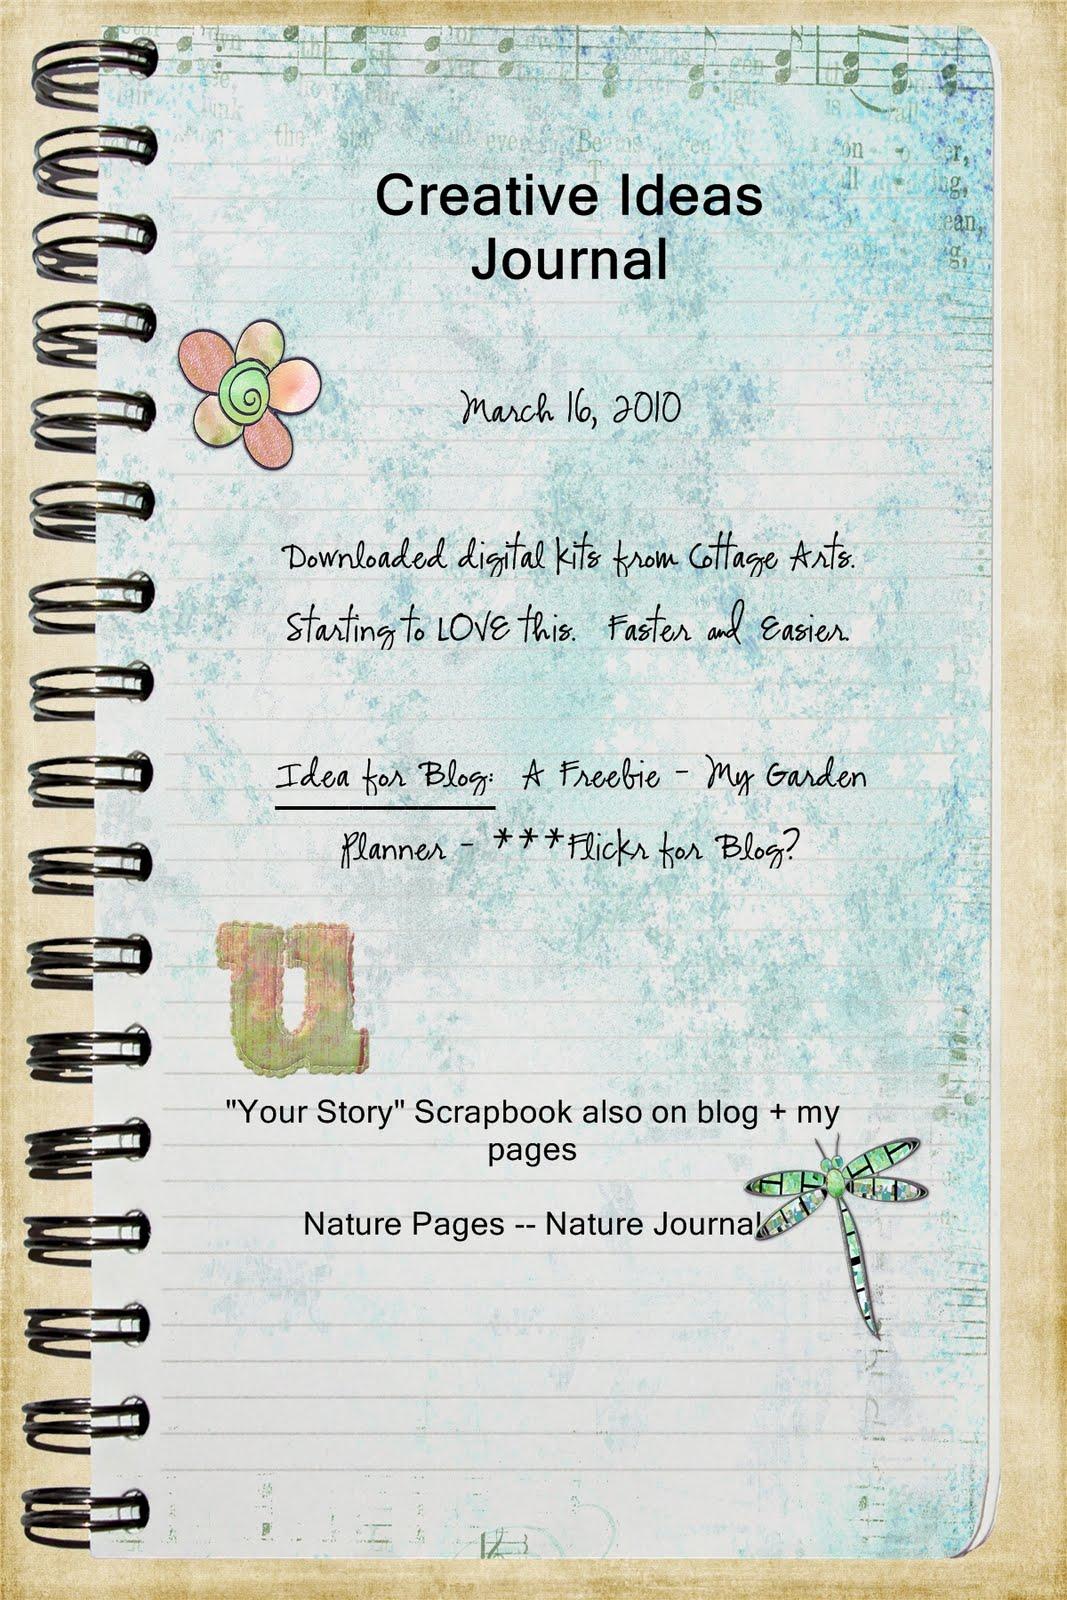 Journey scrapbook ideas - Creative Ideas Journal